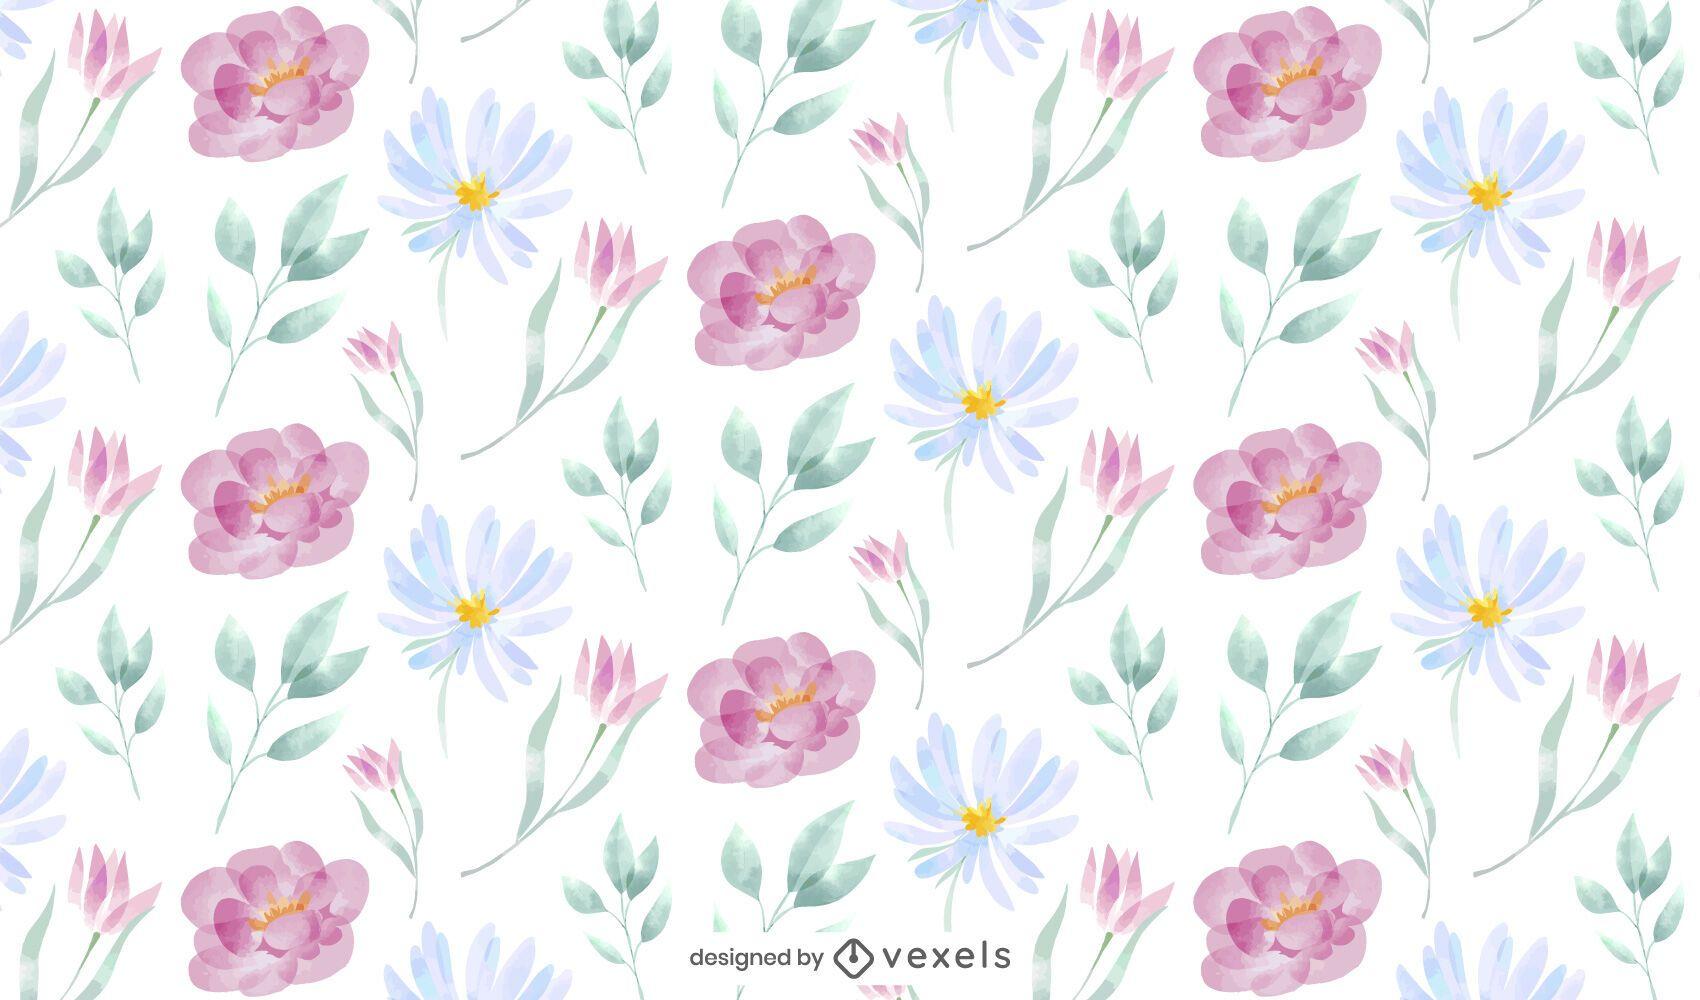 Diseño de patrón de naturaleza de flor de acuarela